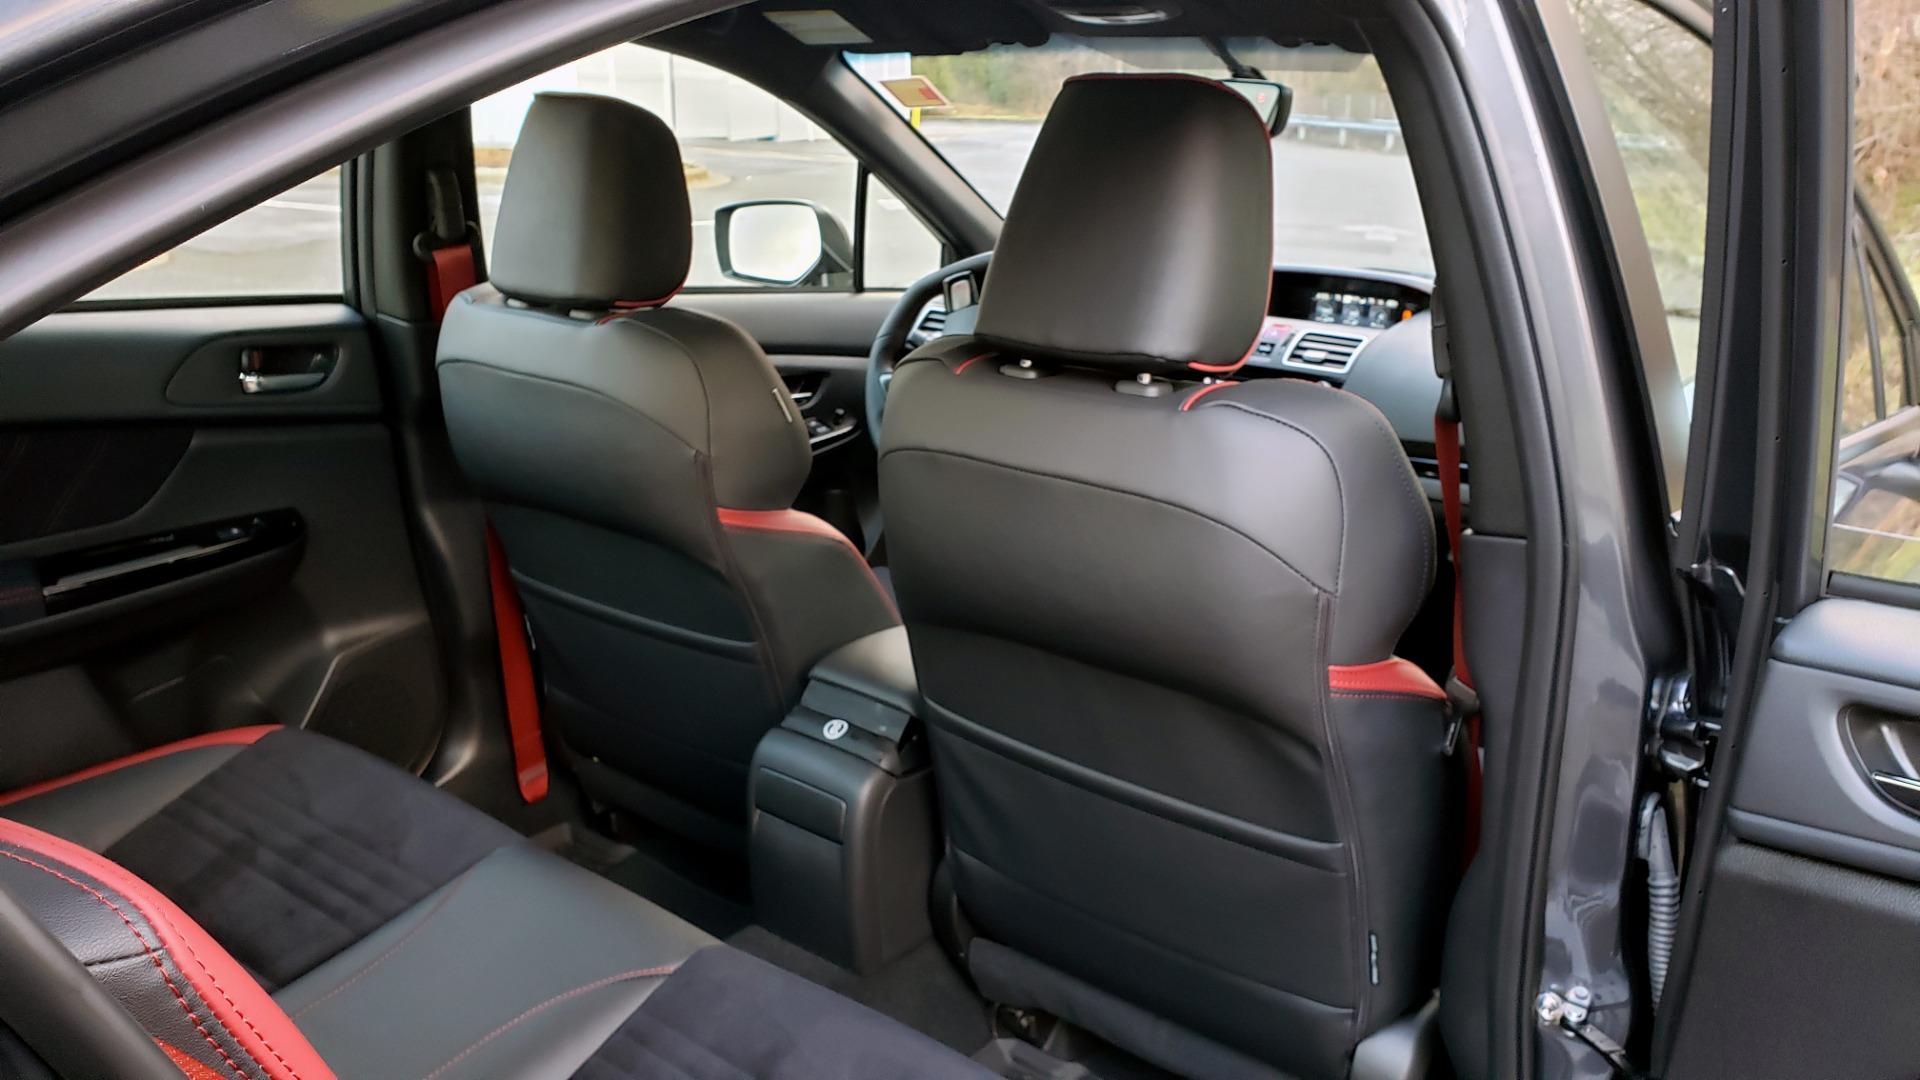 Used 2020 Subaru WRX STI 2.5L TURBO / 6-SPEED MANUAL / RECARO SEATS / REARVIEW for sale Sold at Formula Imports in Charlotte NC 28227 85